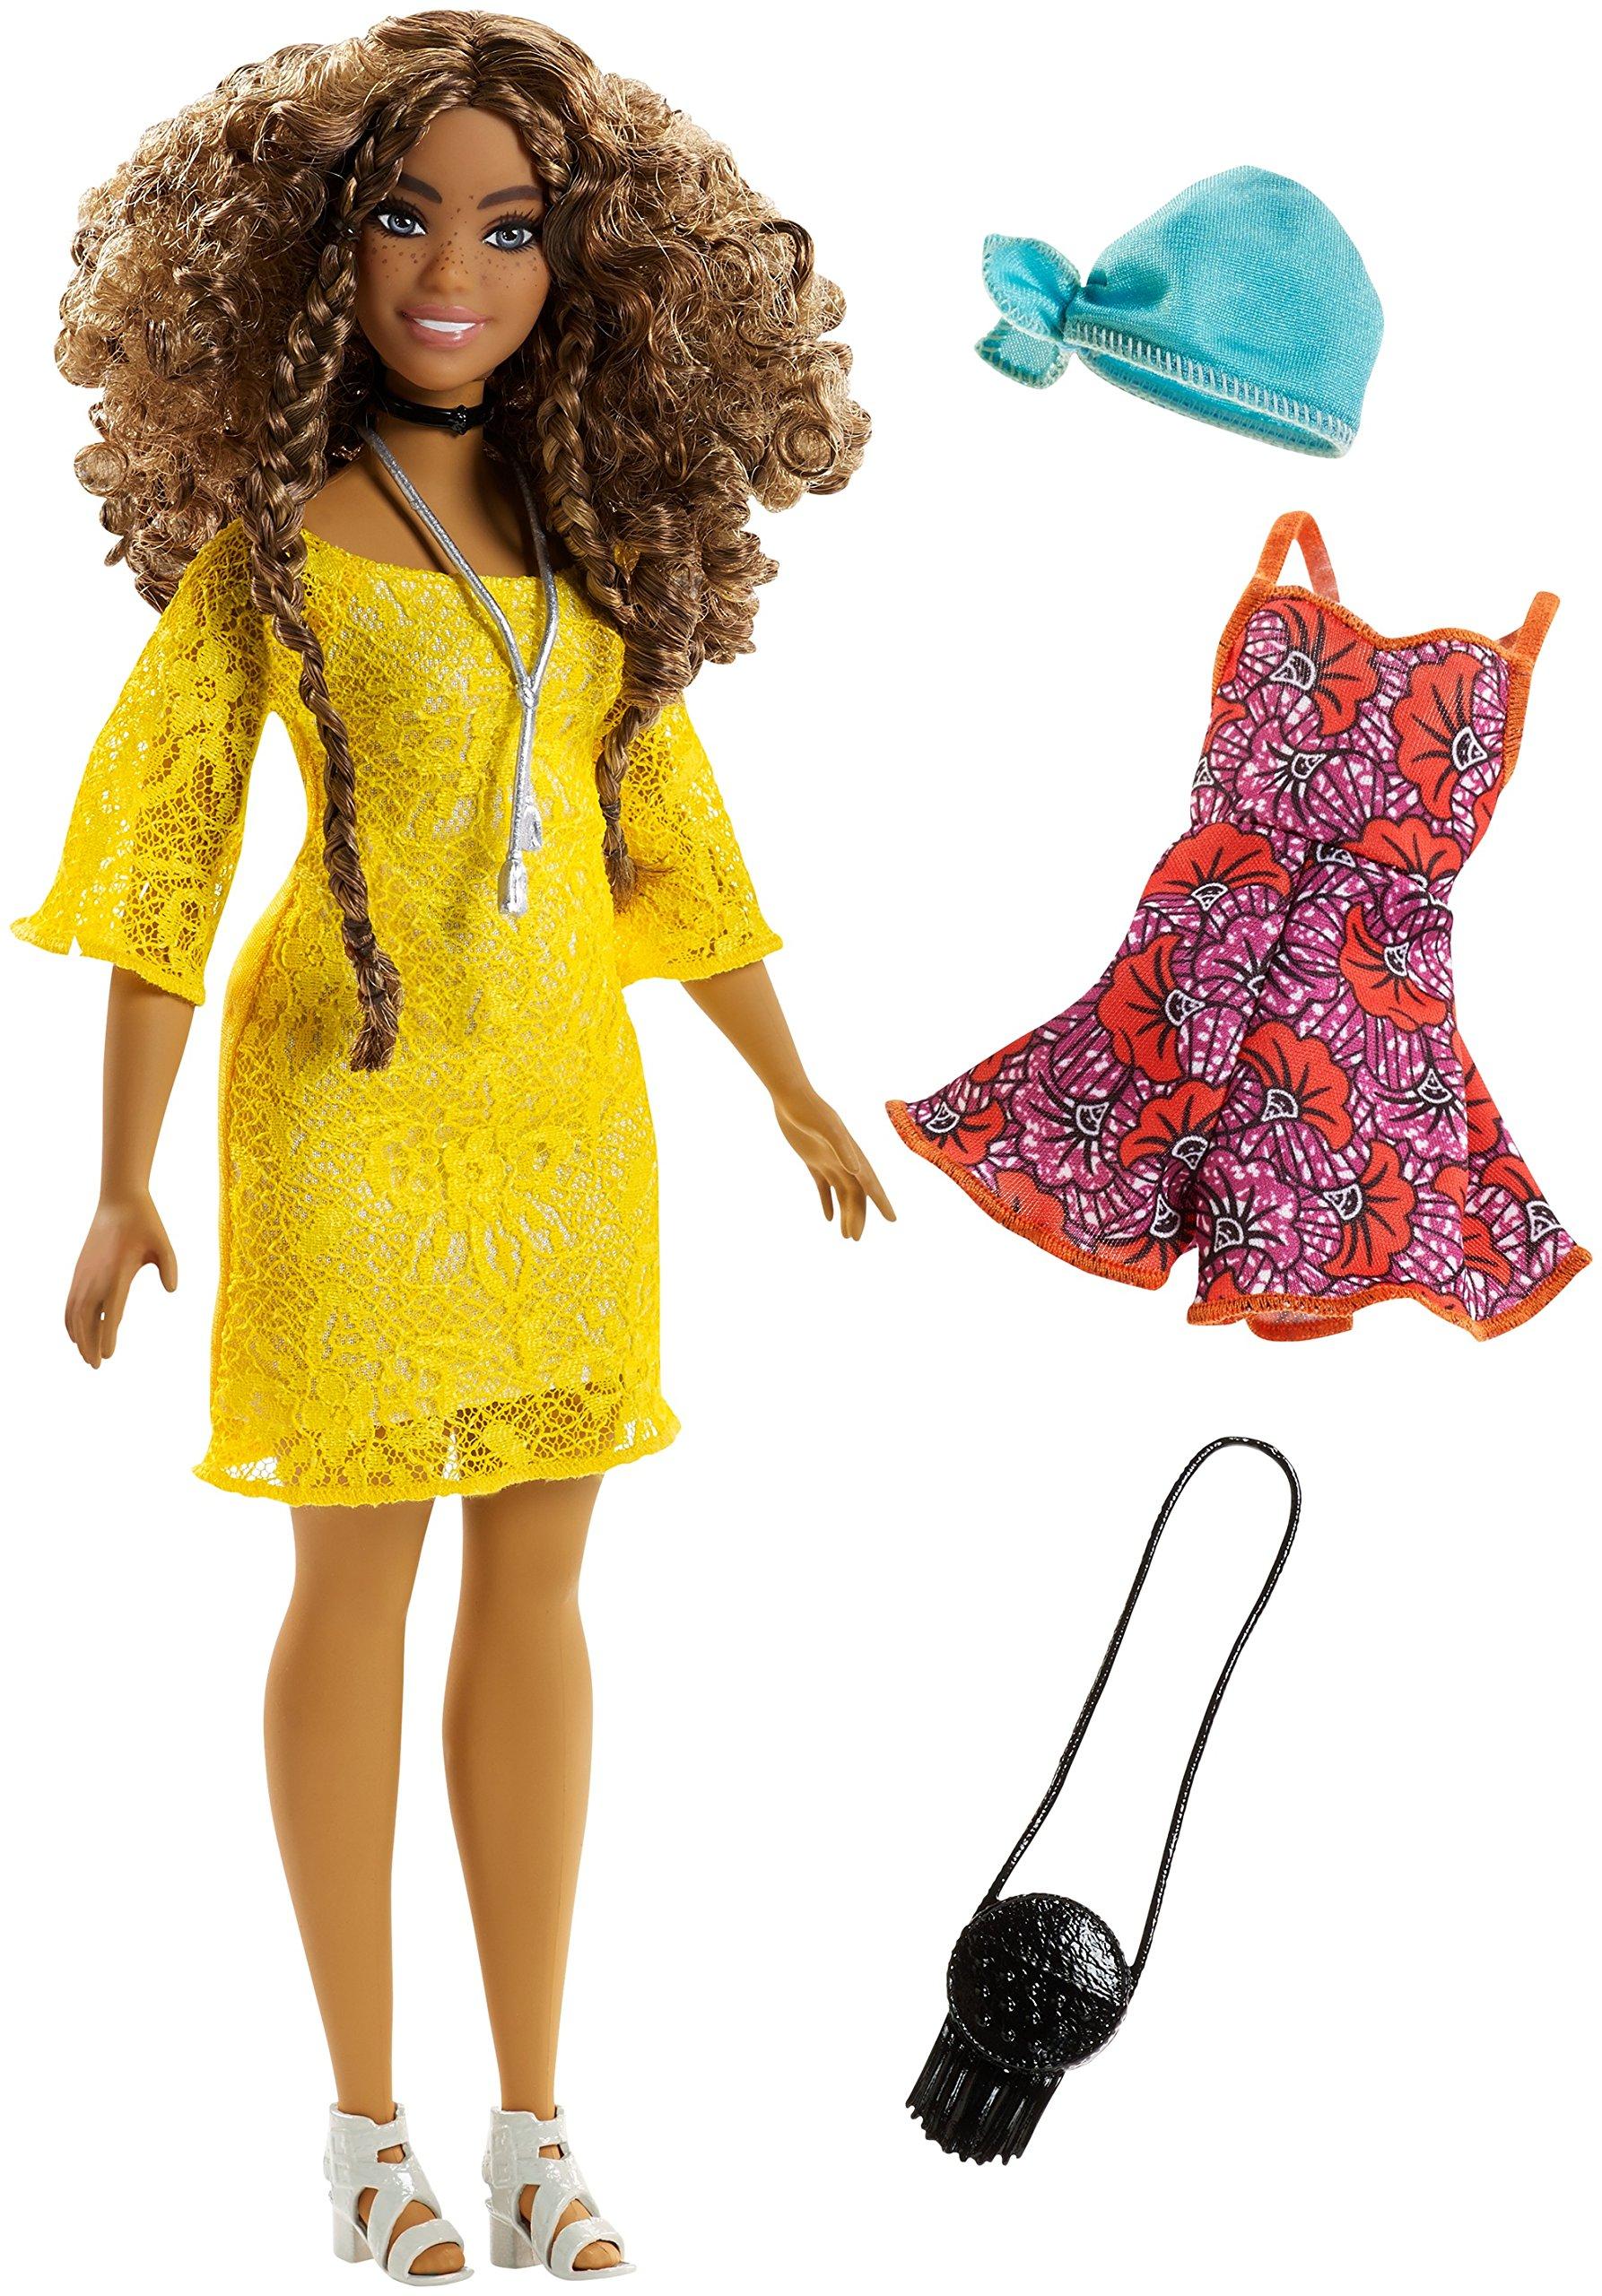 Barbie Fashionistas #85 Boho Doll, Curvy